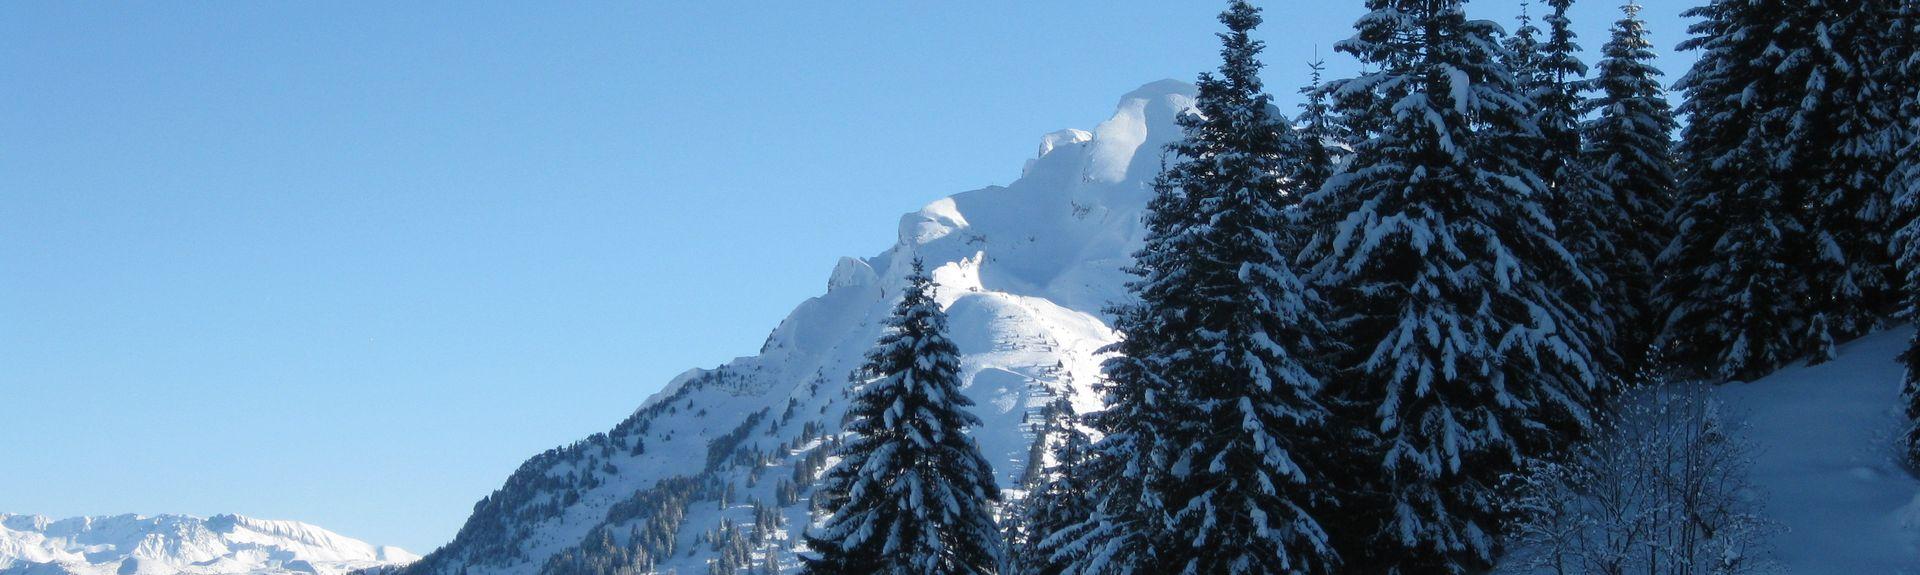 Les Pèlerins station, Chamonix-Mont-Blanc, Auvergne - Rhône - Alpes, Frankrike